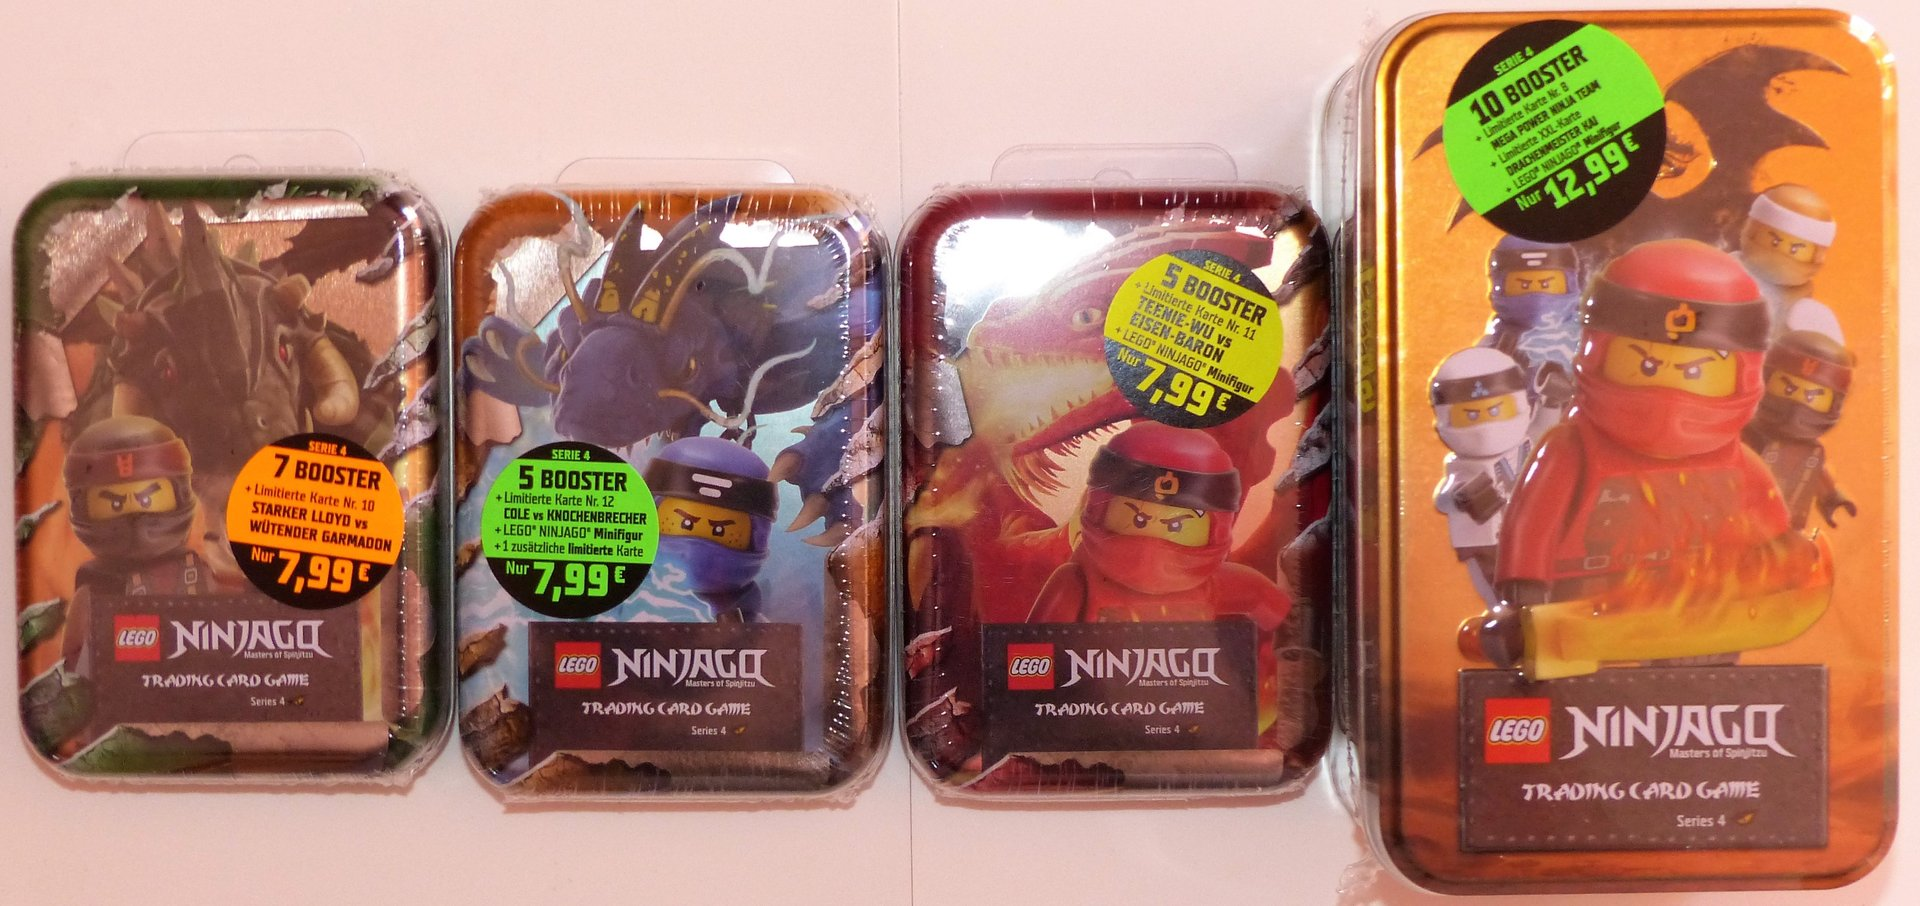 TRADING CARD EISEN-BARON Lego Ninjago limitiert Serie 4: LE 11 TEENIE-WU vs